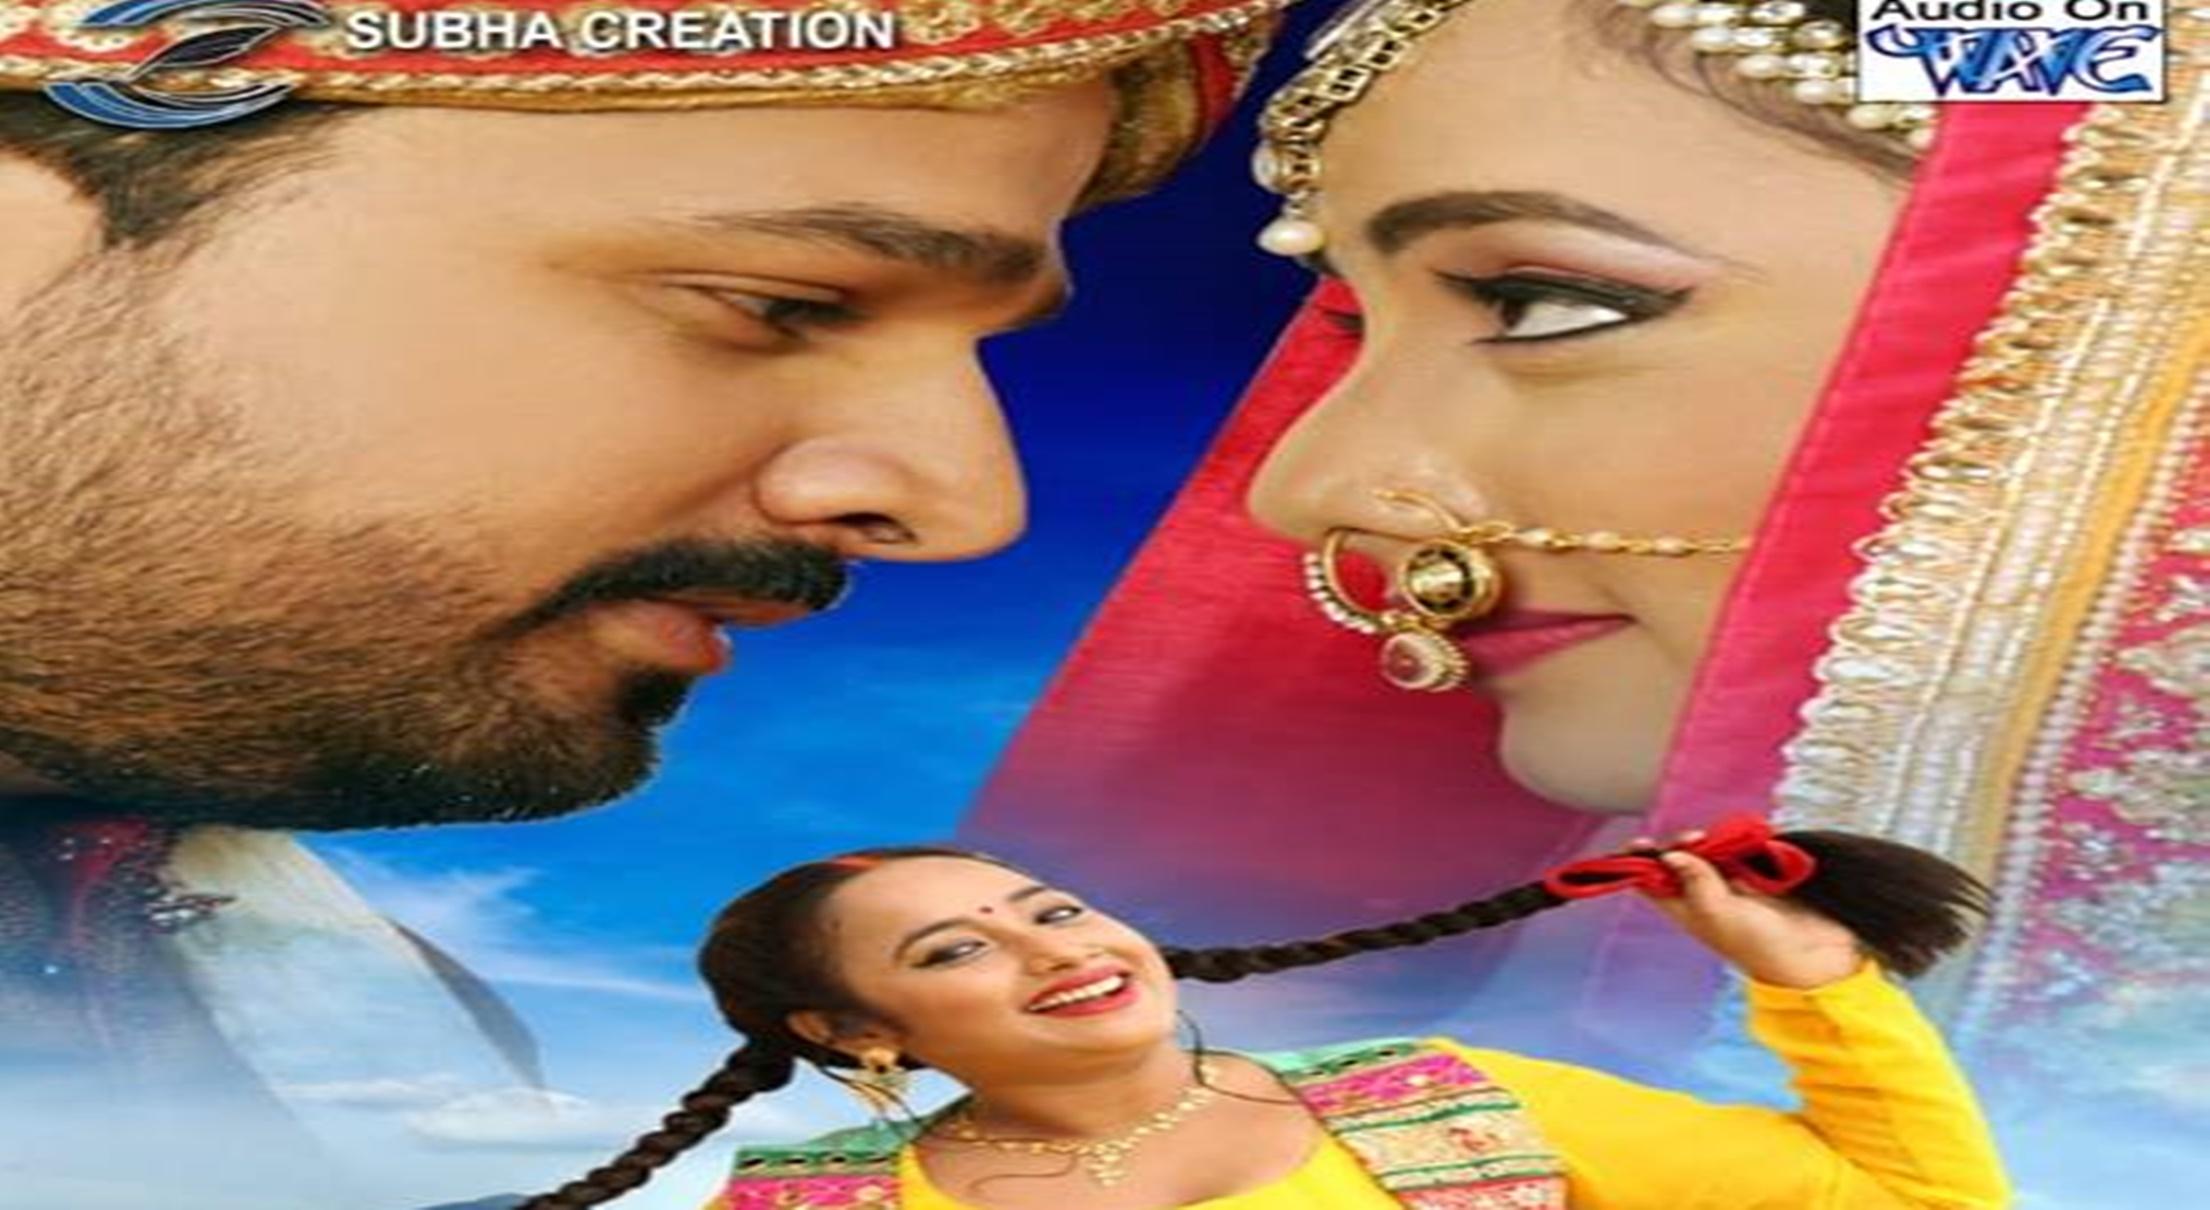 Raja Rani First Look